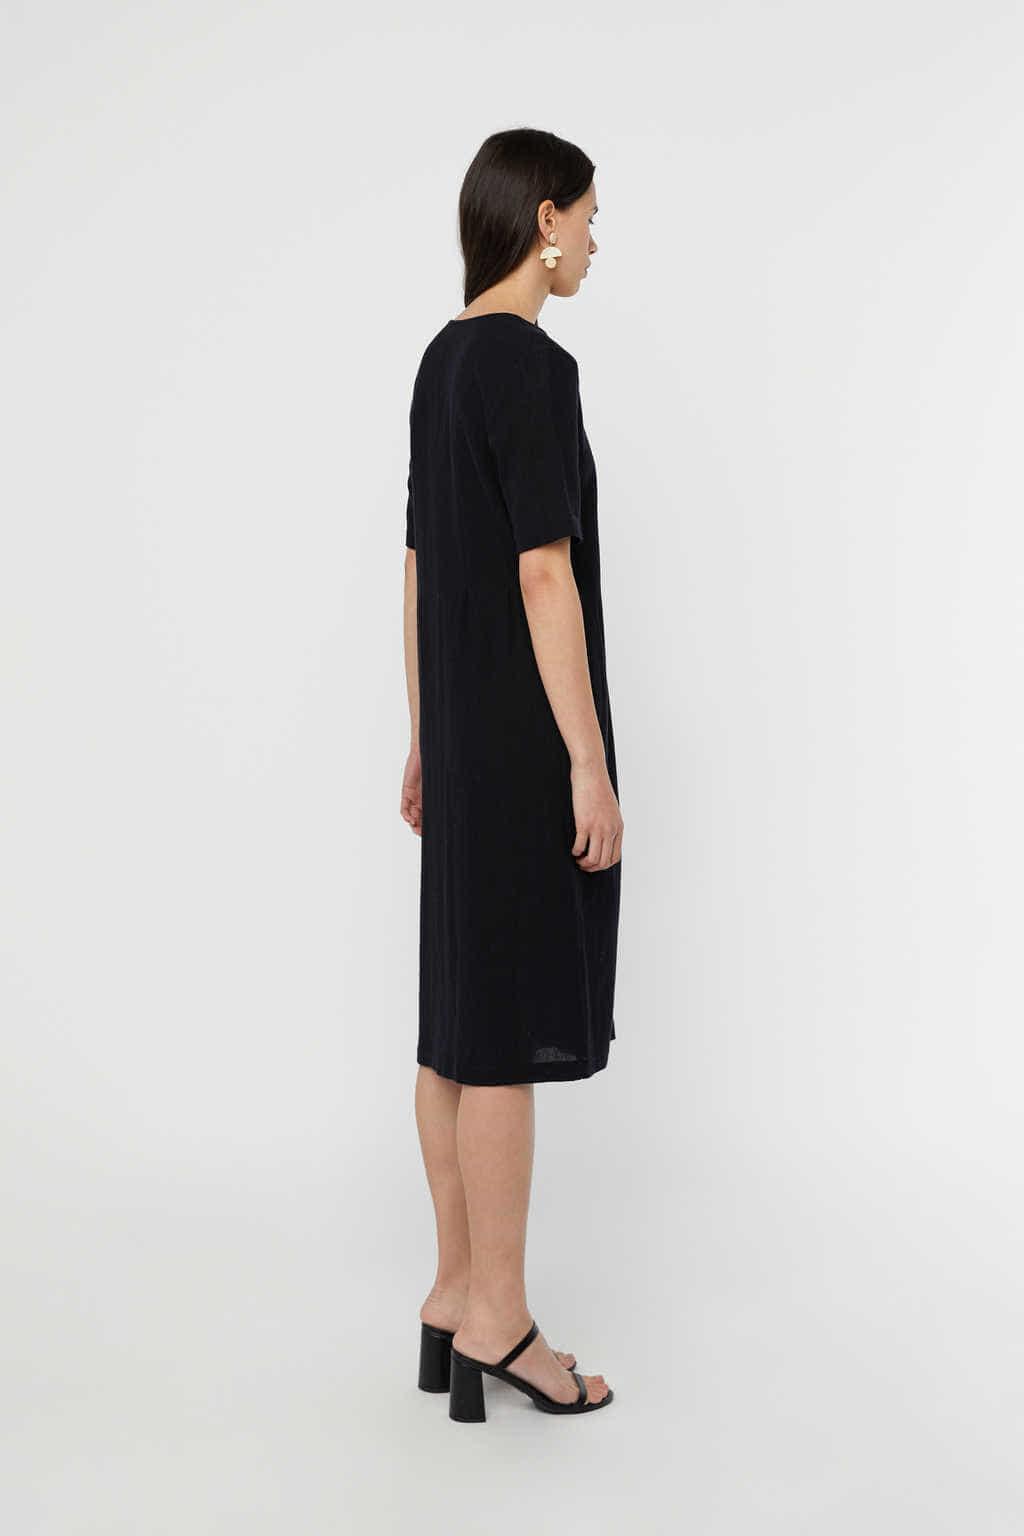 Dress 3159 Black 11